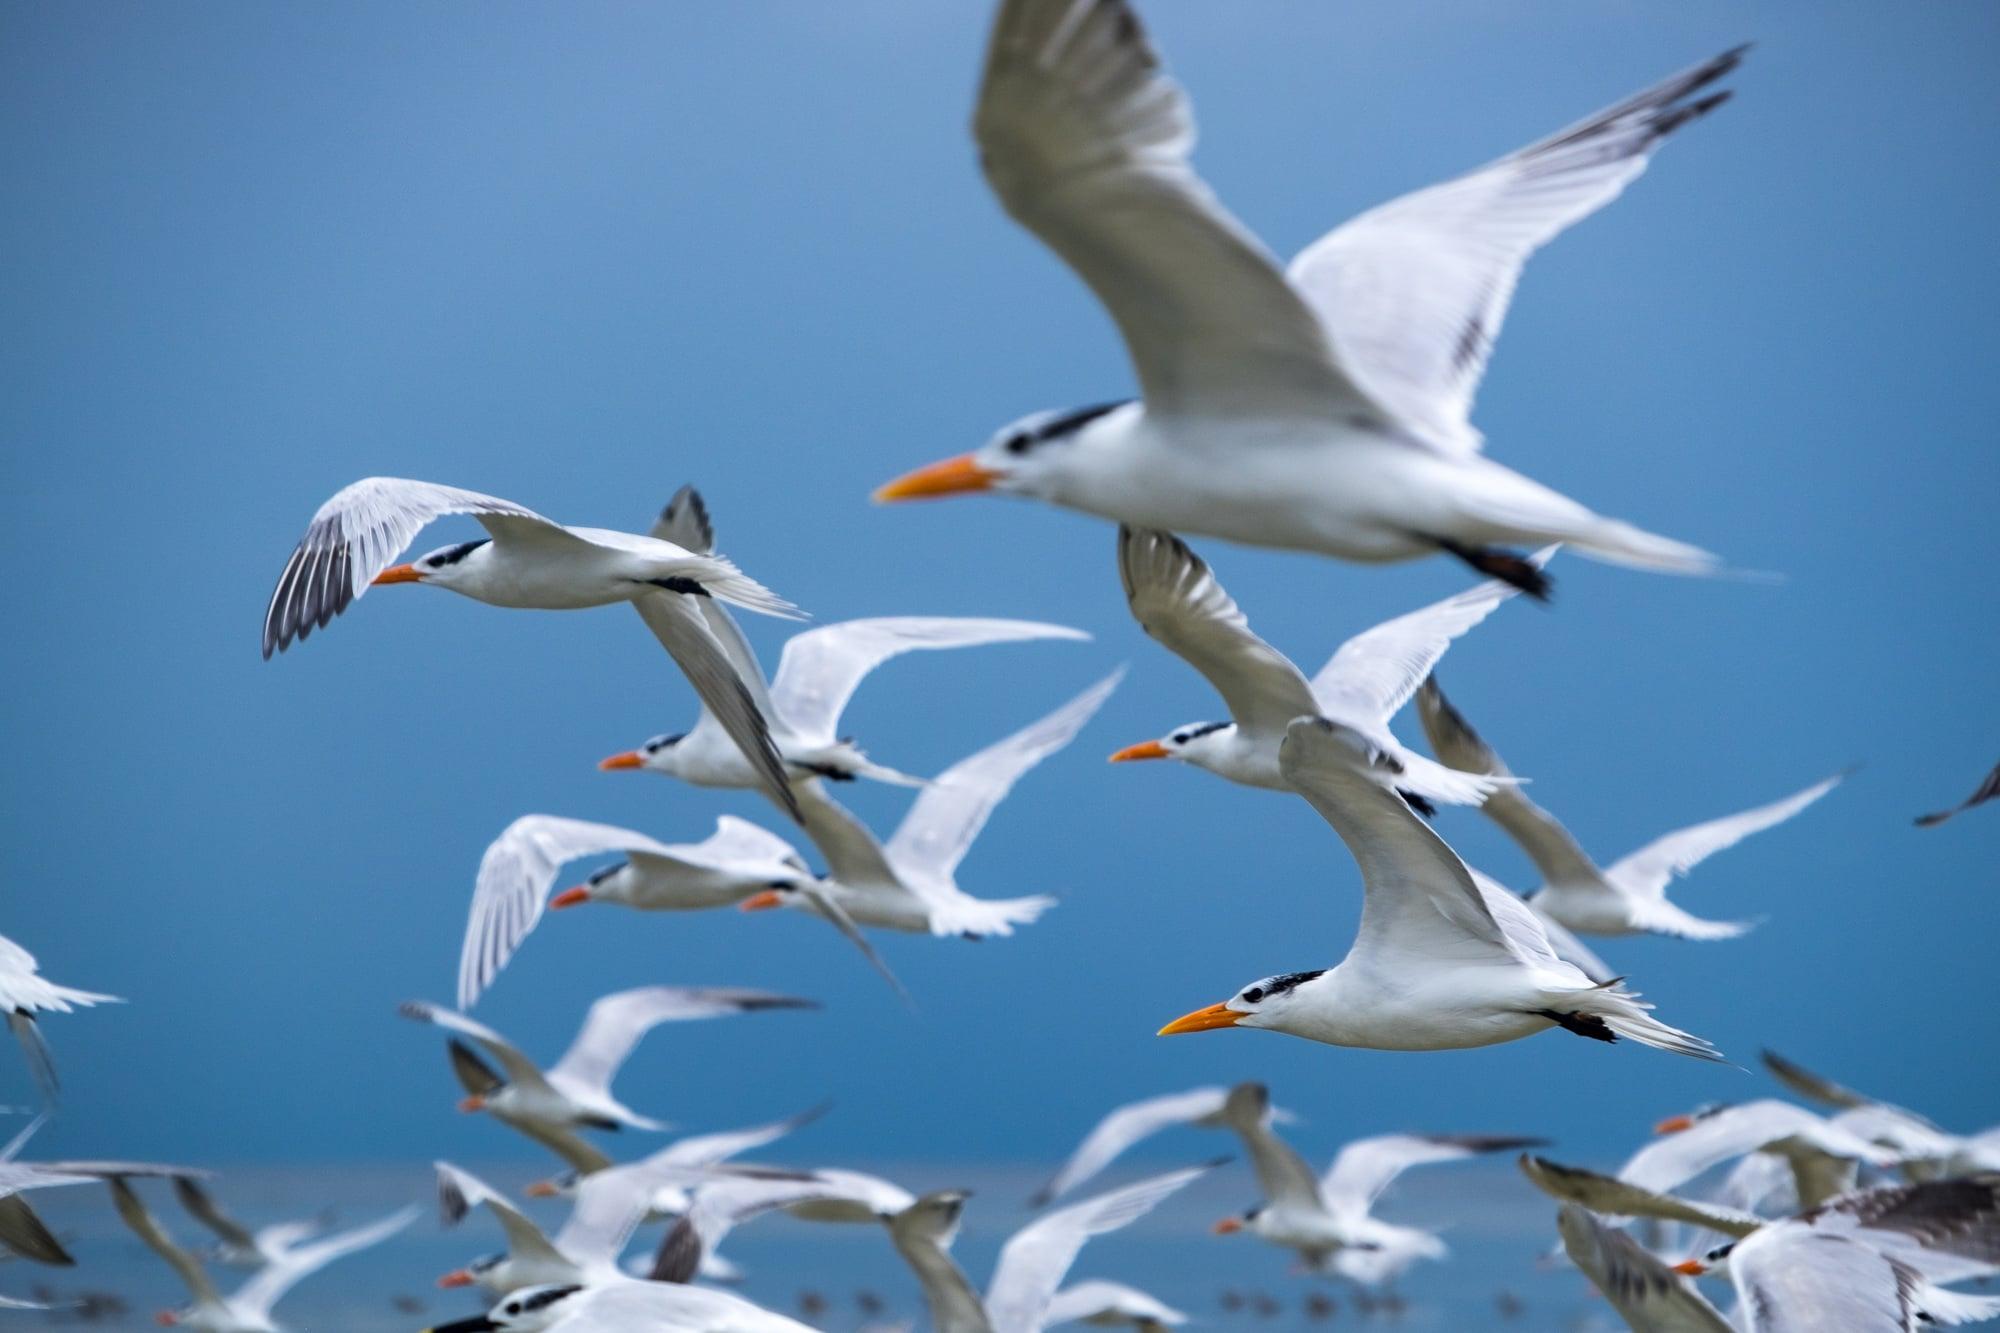 Beautiful image of birds in flight.